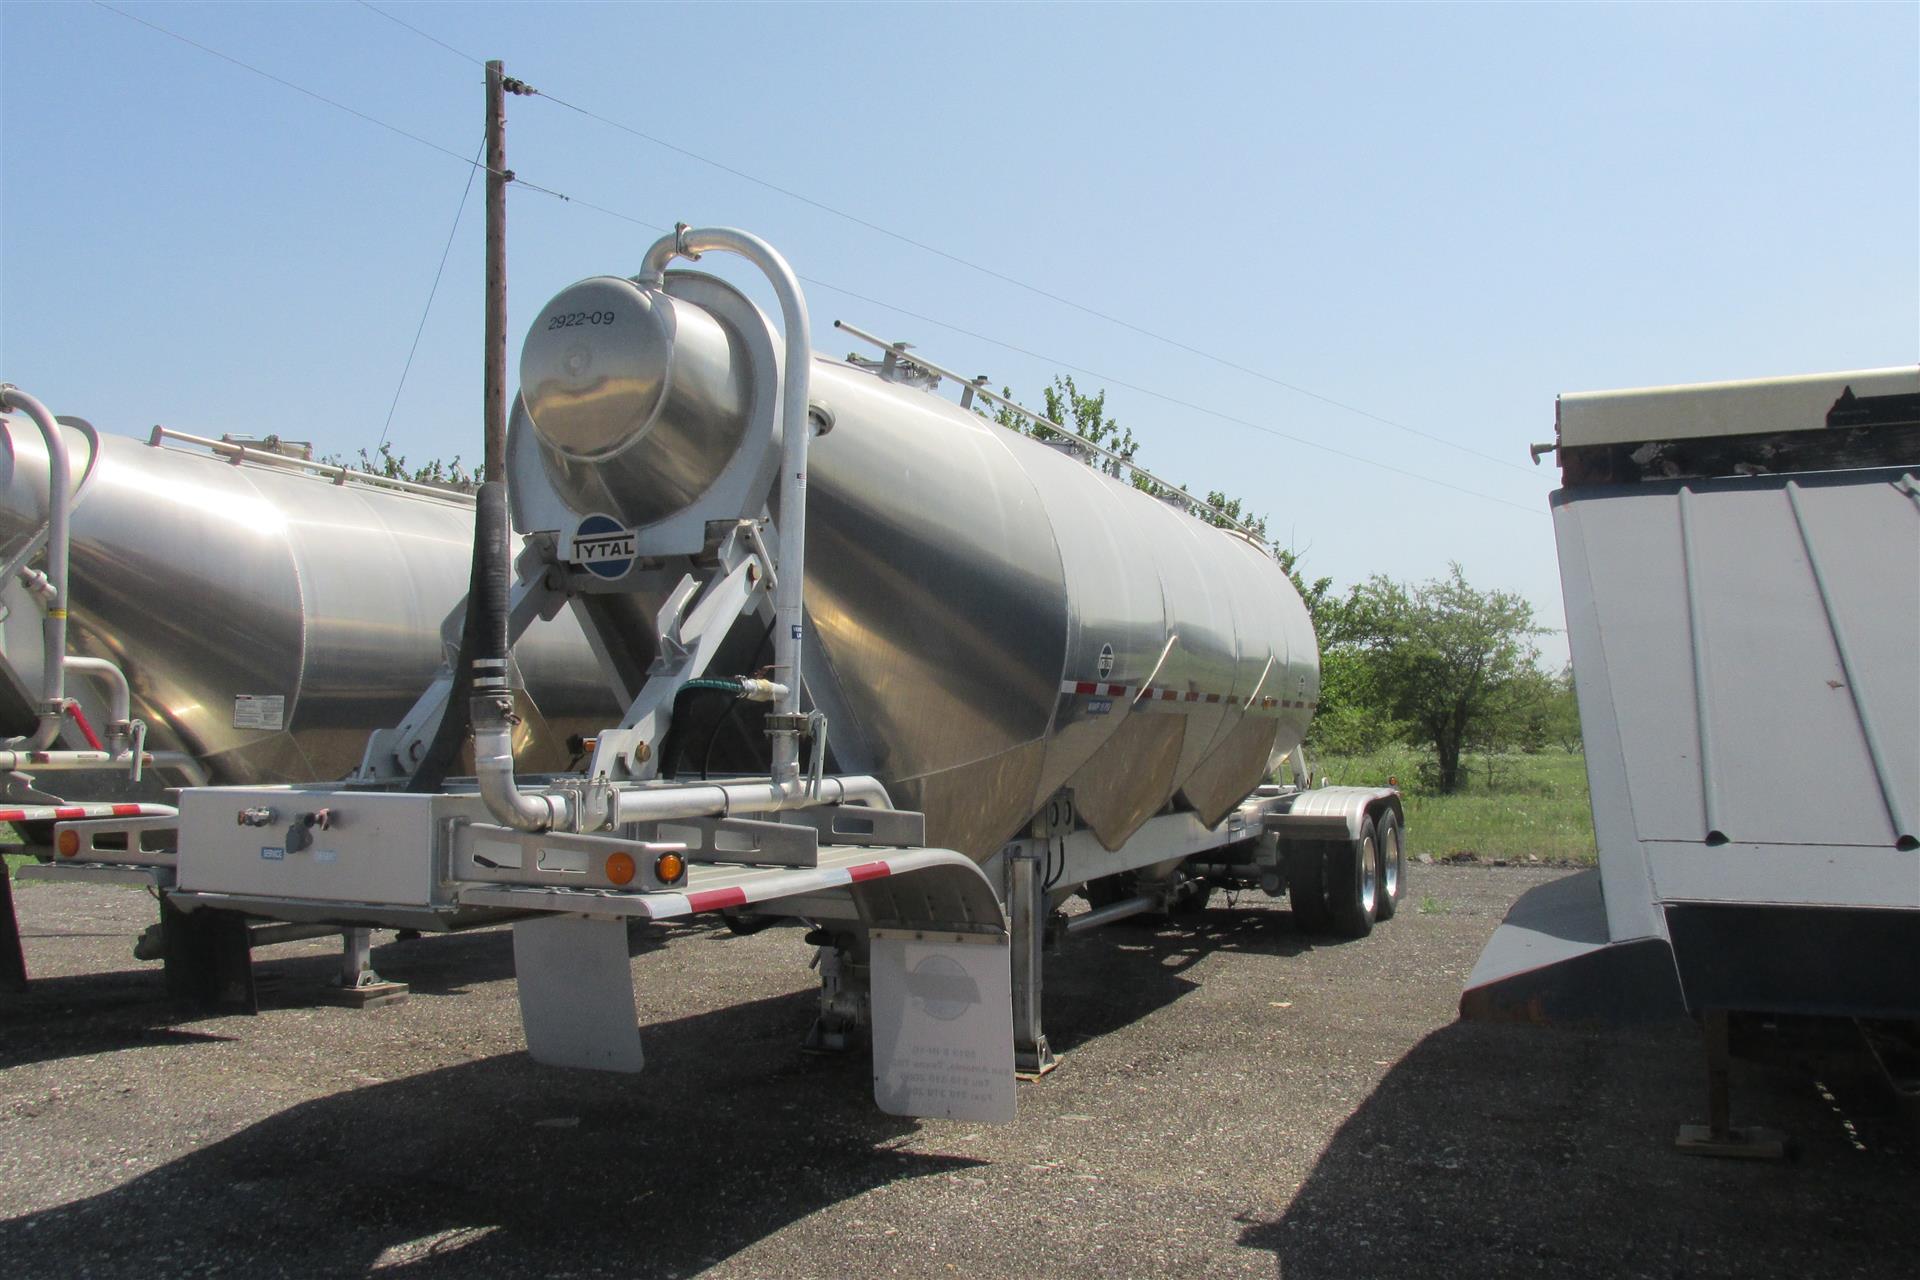 2015 Tytal Pneumatic Tanker